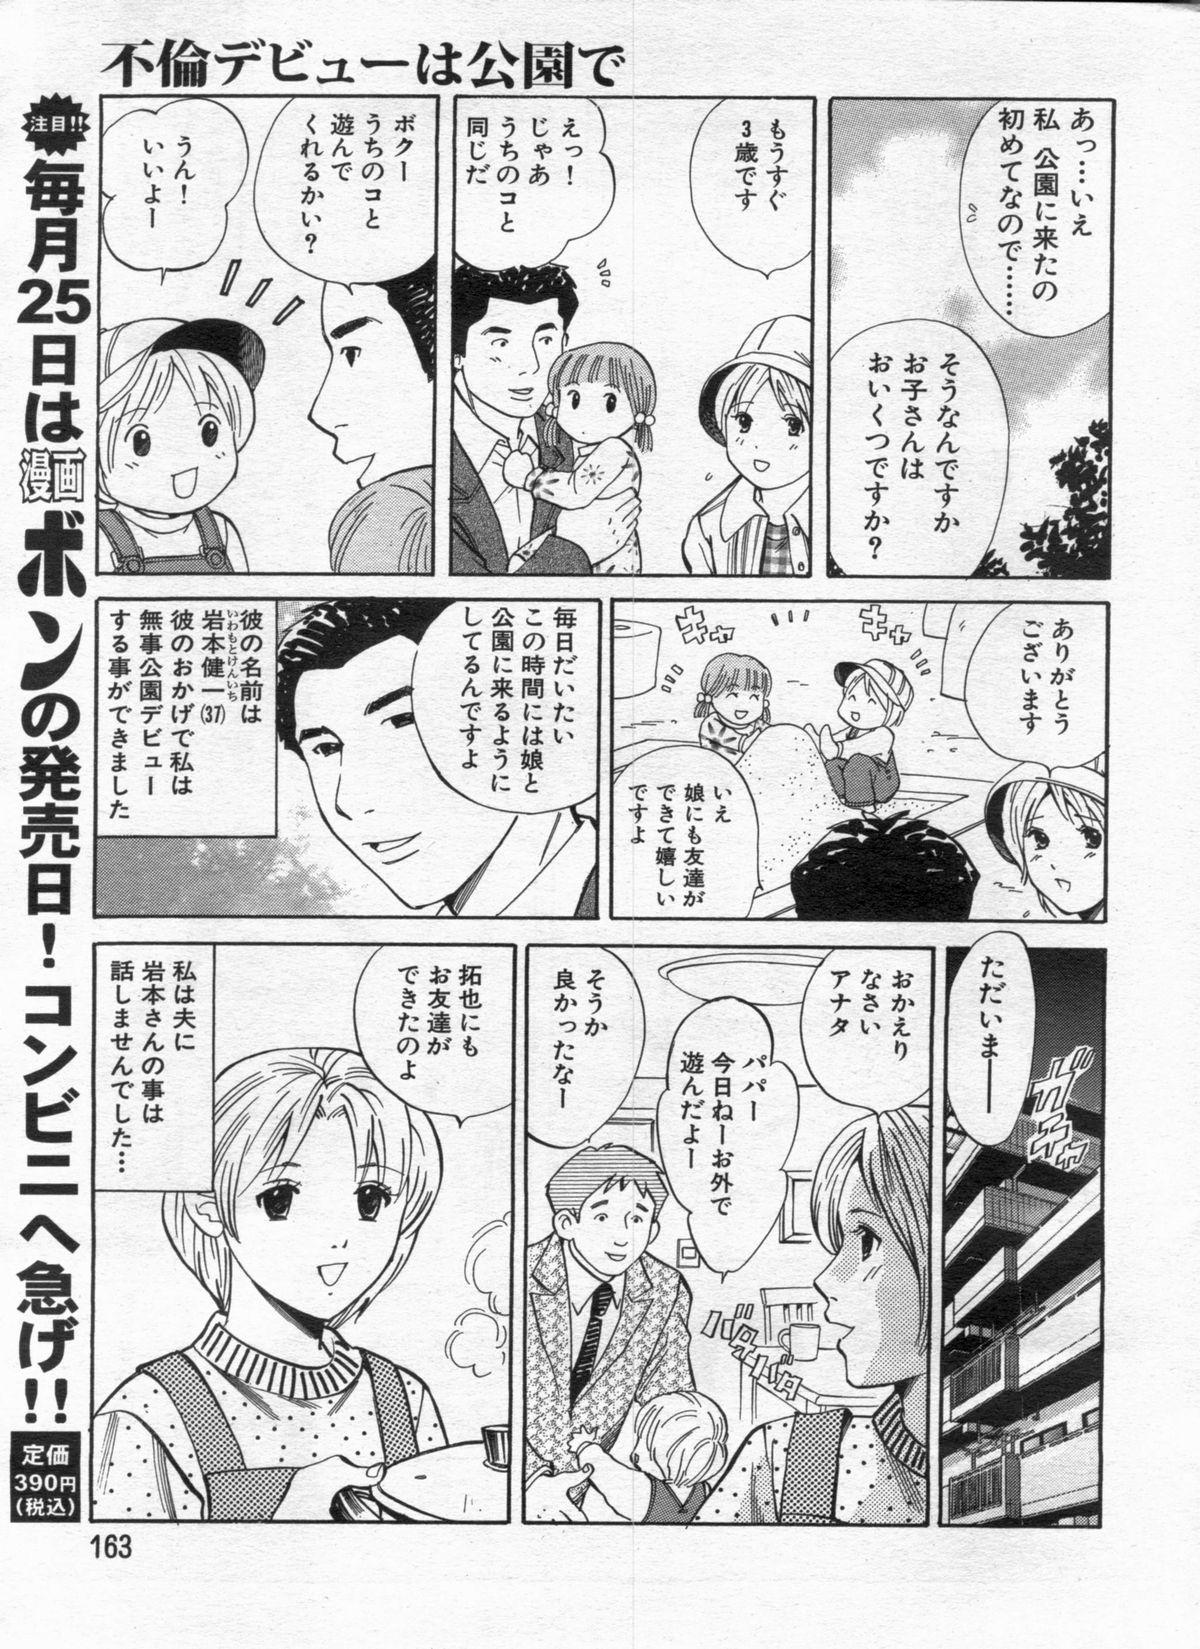 Manga Bon 2013-02 162